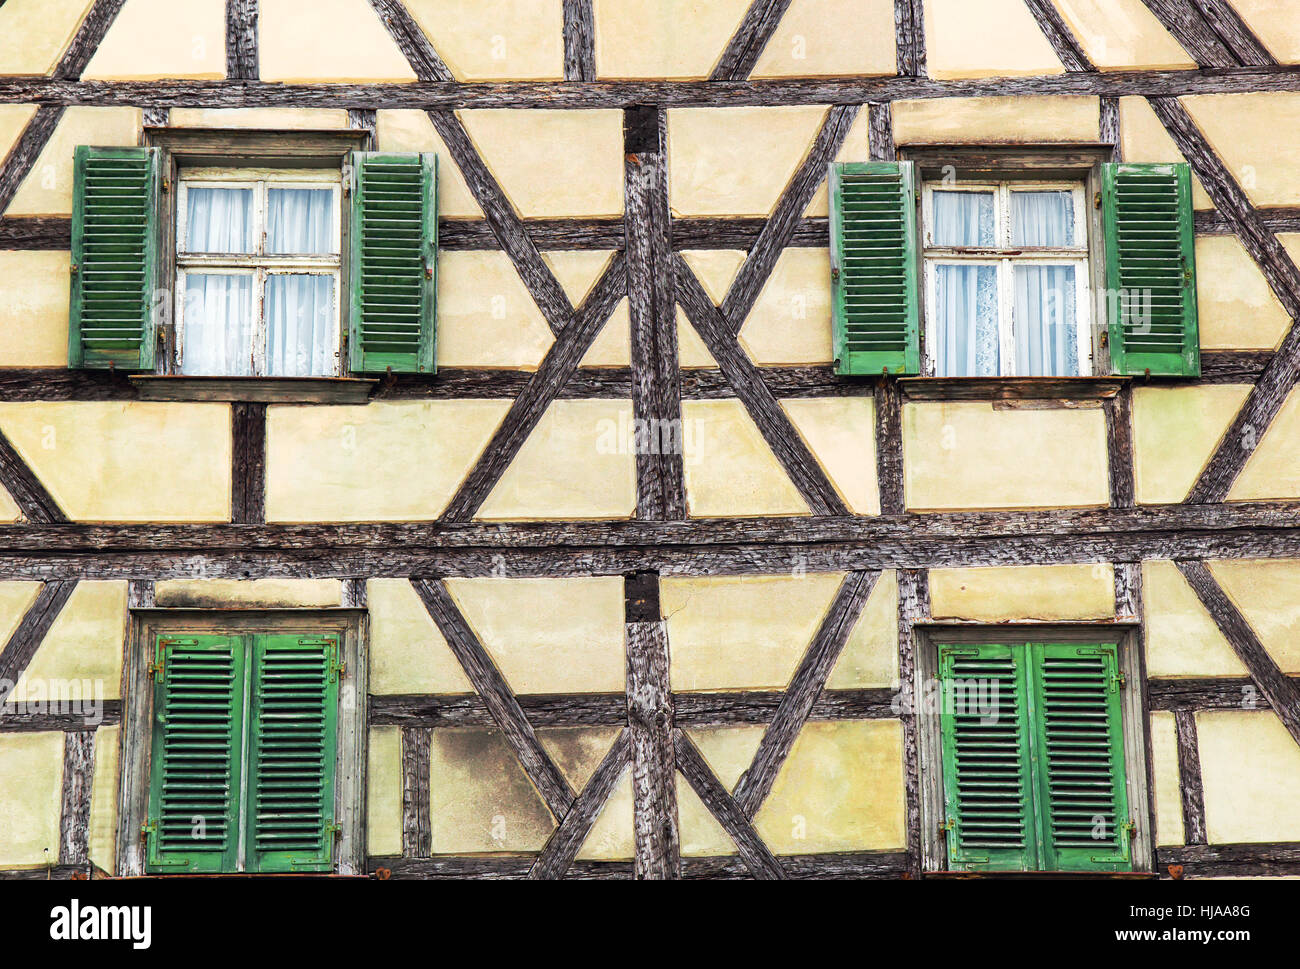 Facade of fachwerk medieval house - Stock Image